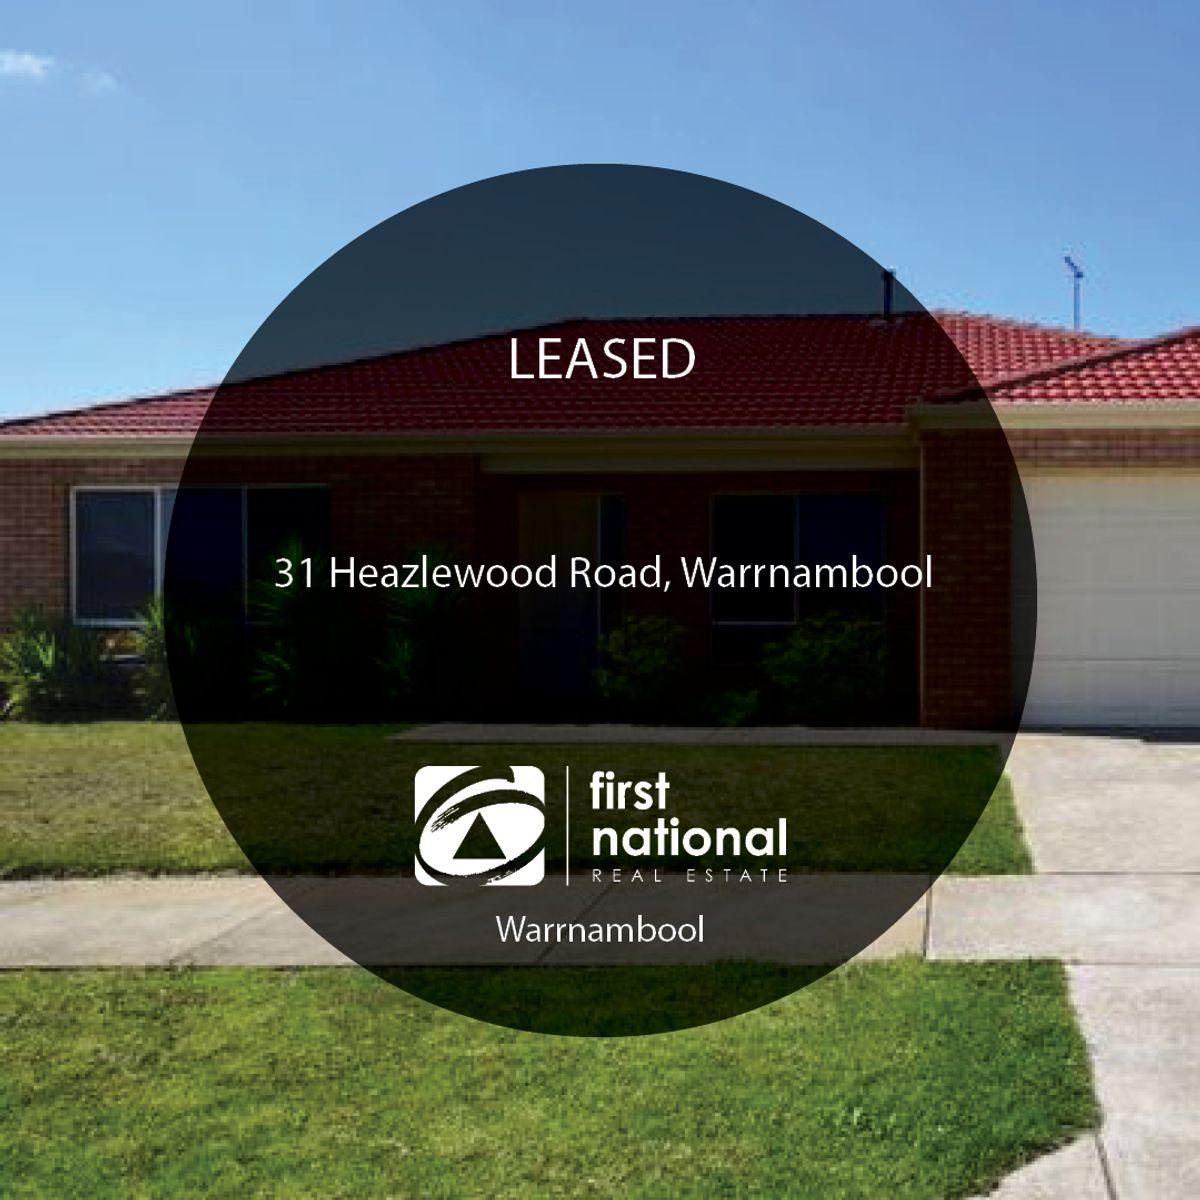 31 Heazlewood Road, Warrnambool, VIC 3280